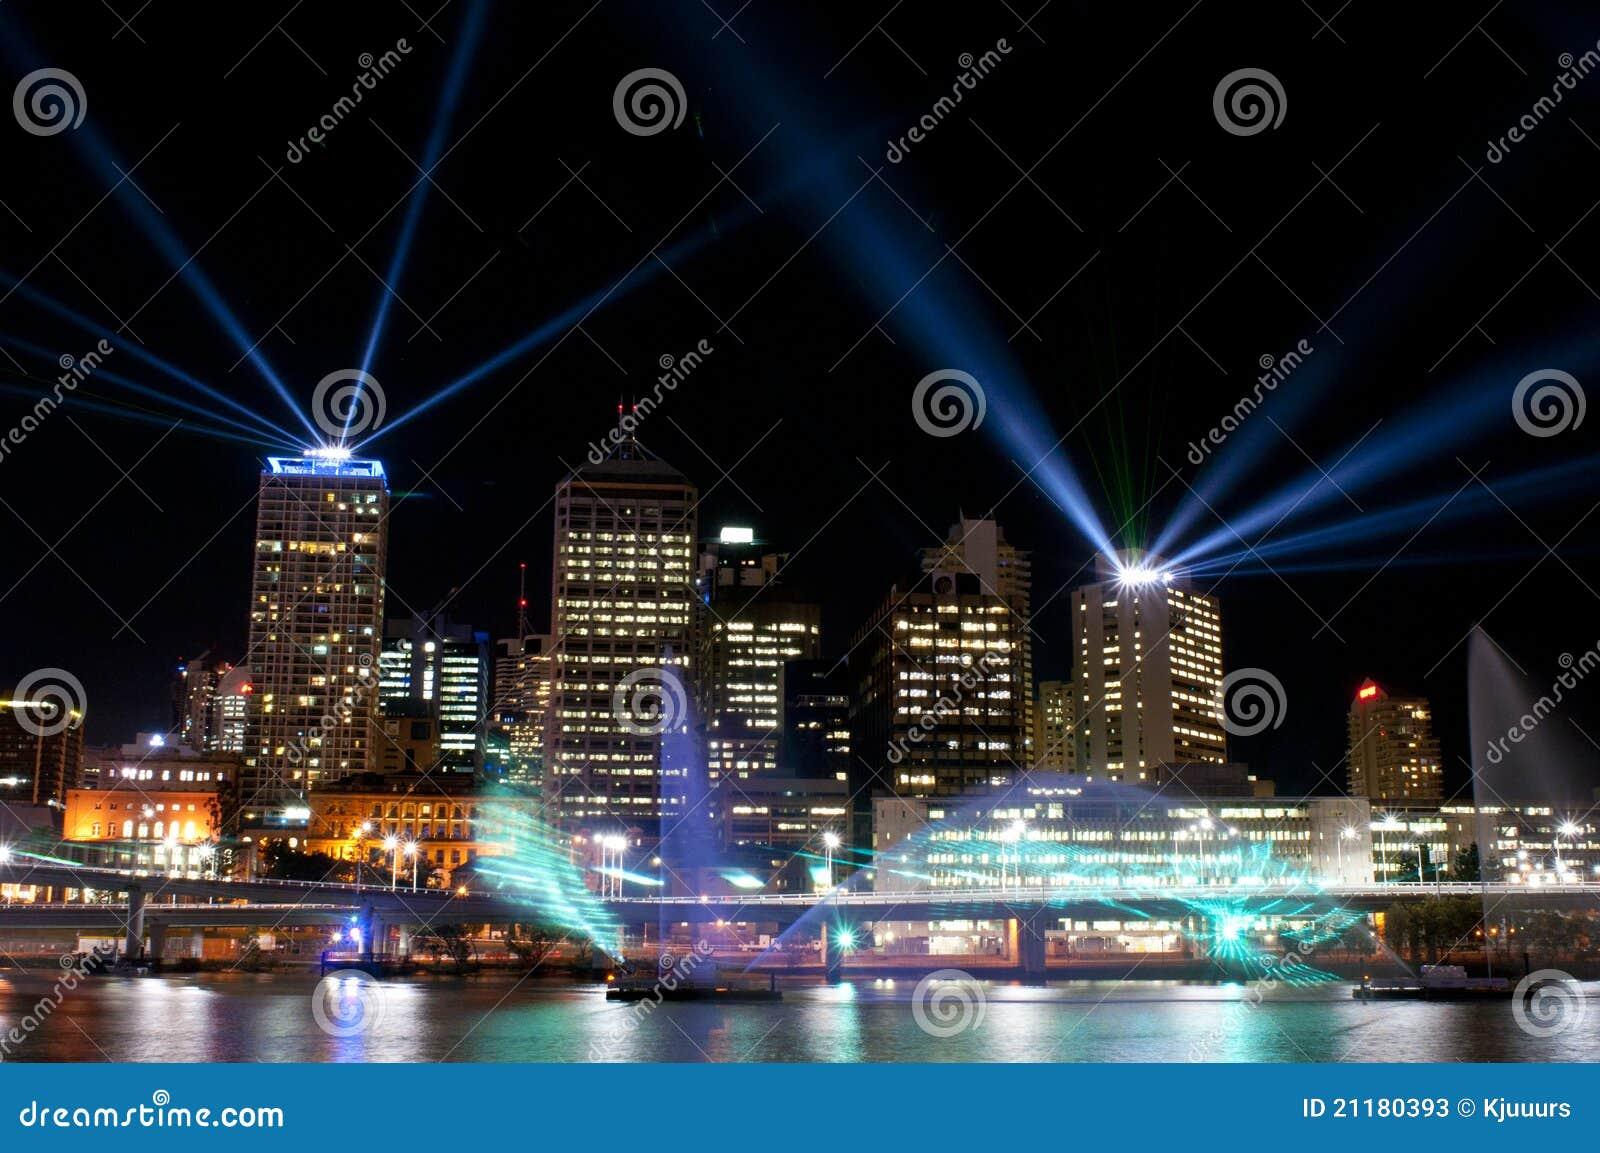 City of Lights, Brisbane, Australia